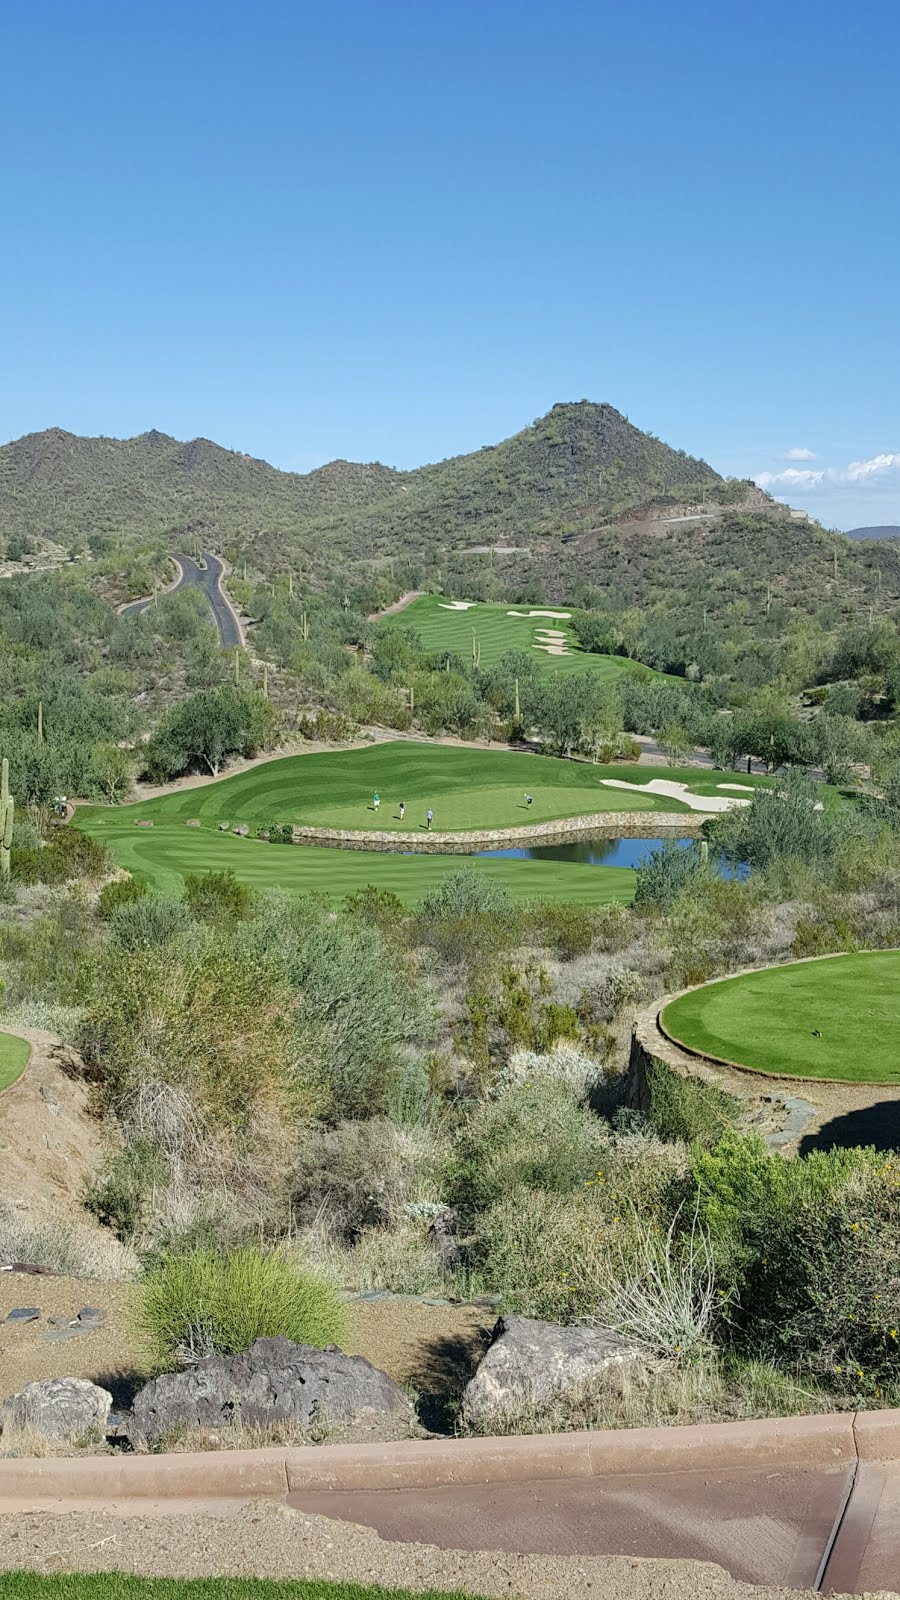 Golf in Arizona. It's an Adventure!